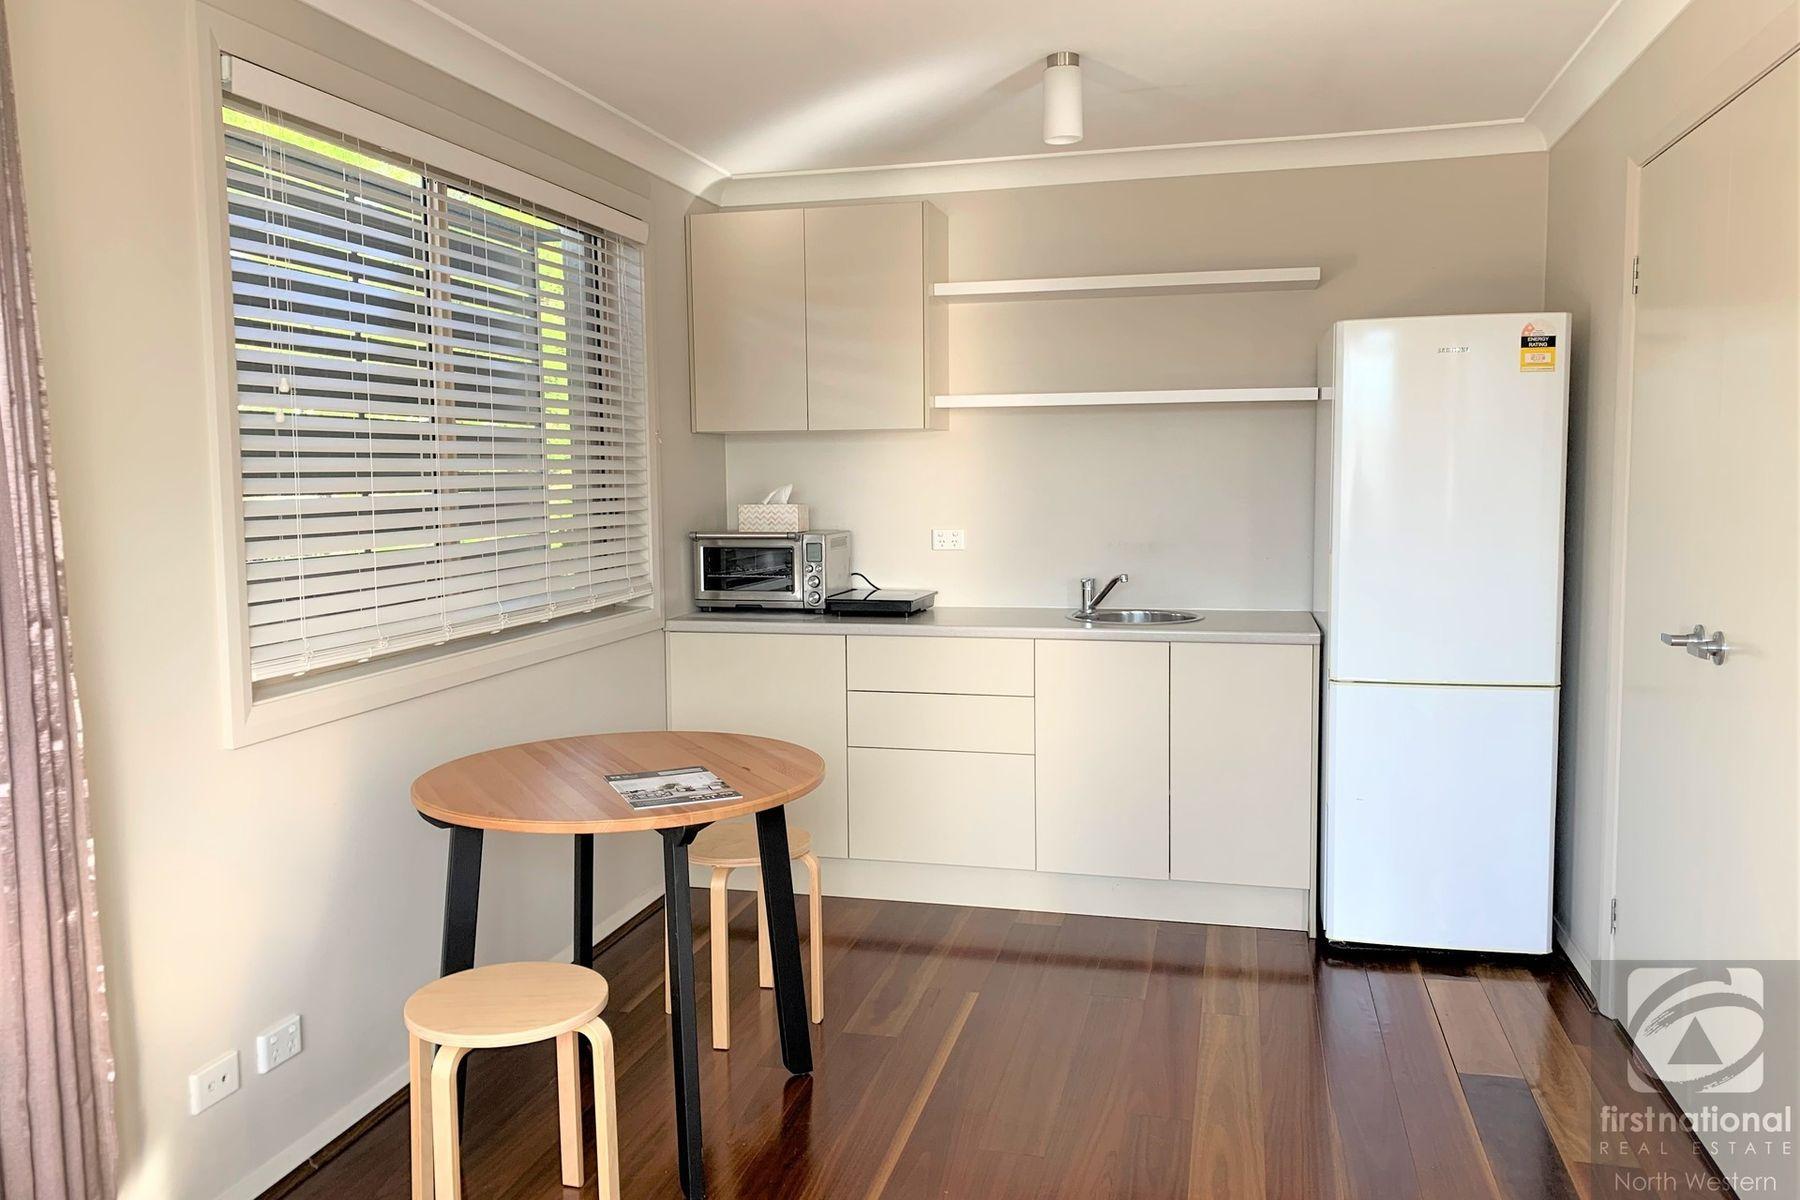 1/31 Elmstree Road, Stanhope Gardens, NSW 2768